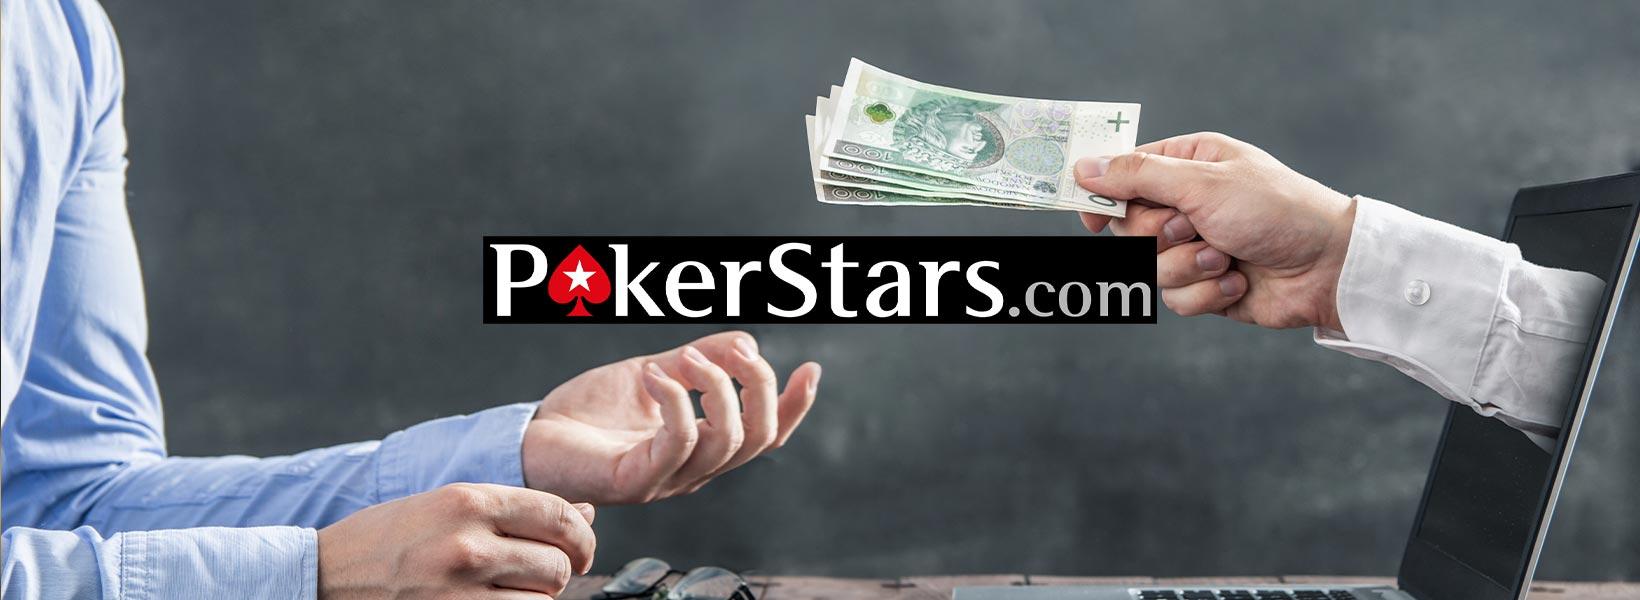 depunere pokerstars